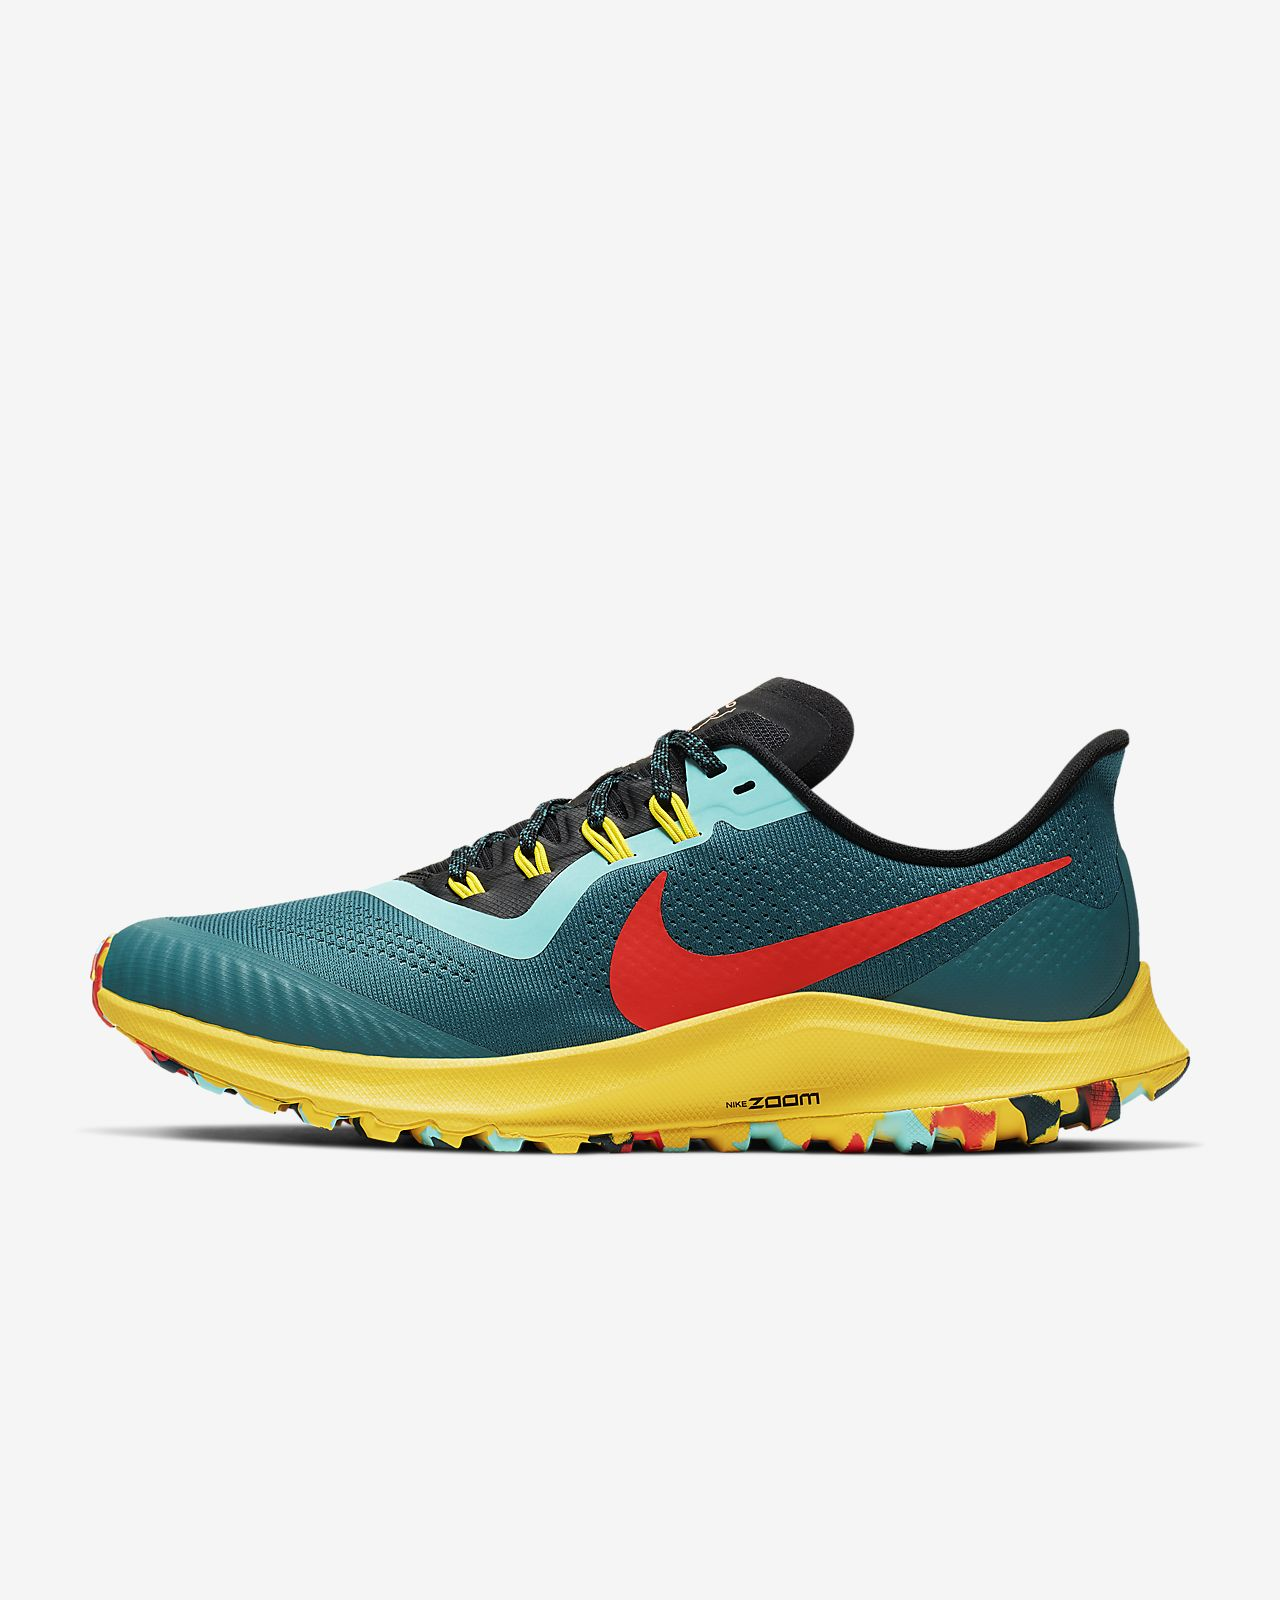 Pour Chaussure De Trail Nike Zoom Pegasus Running Homme 36 Air JuK5T13clF